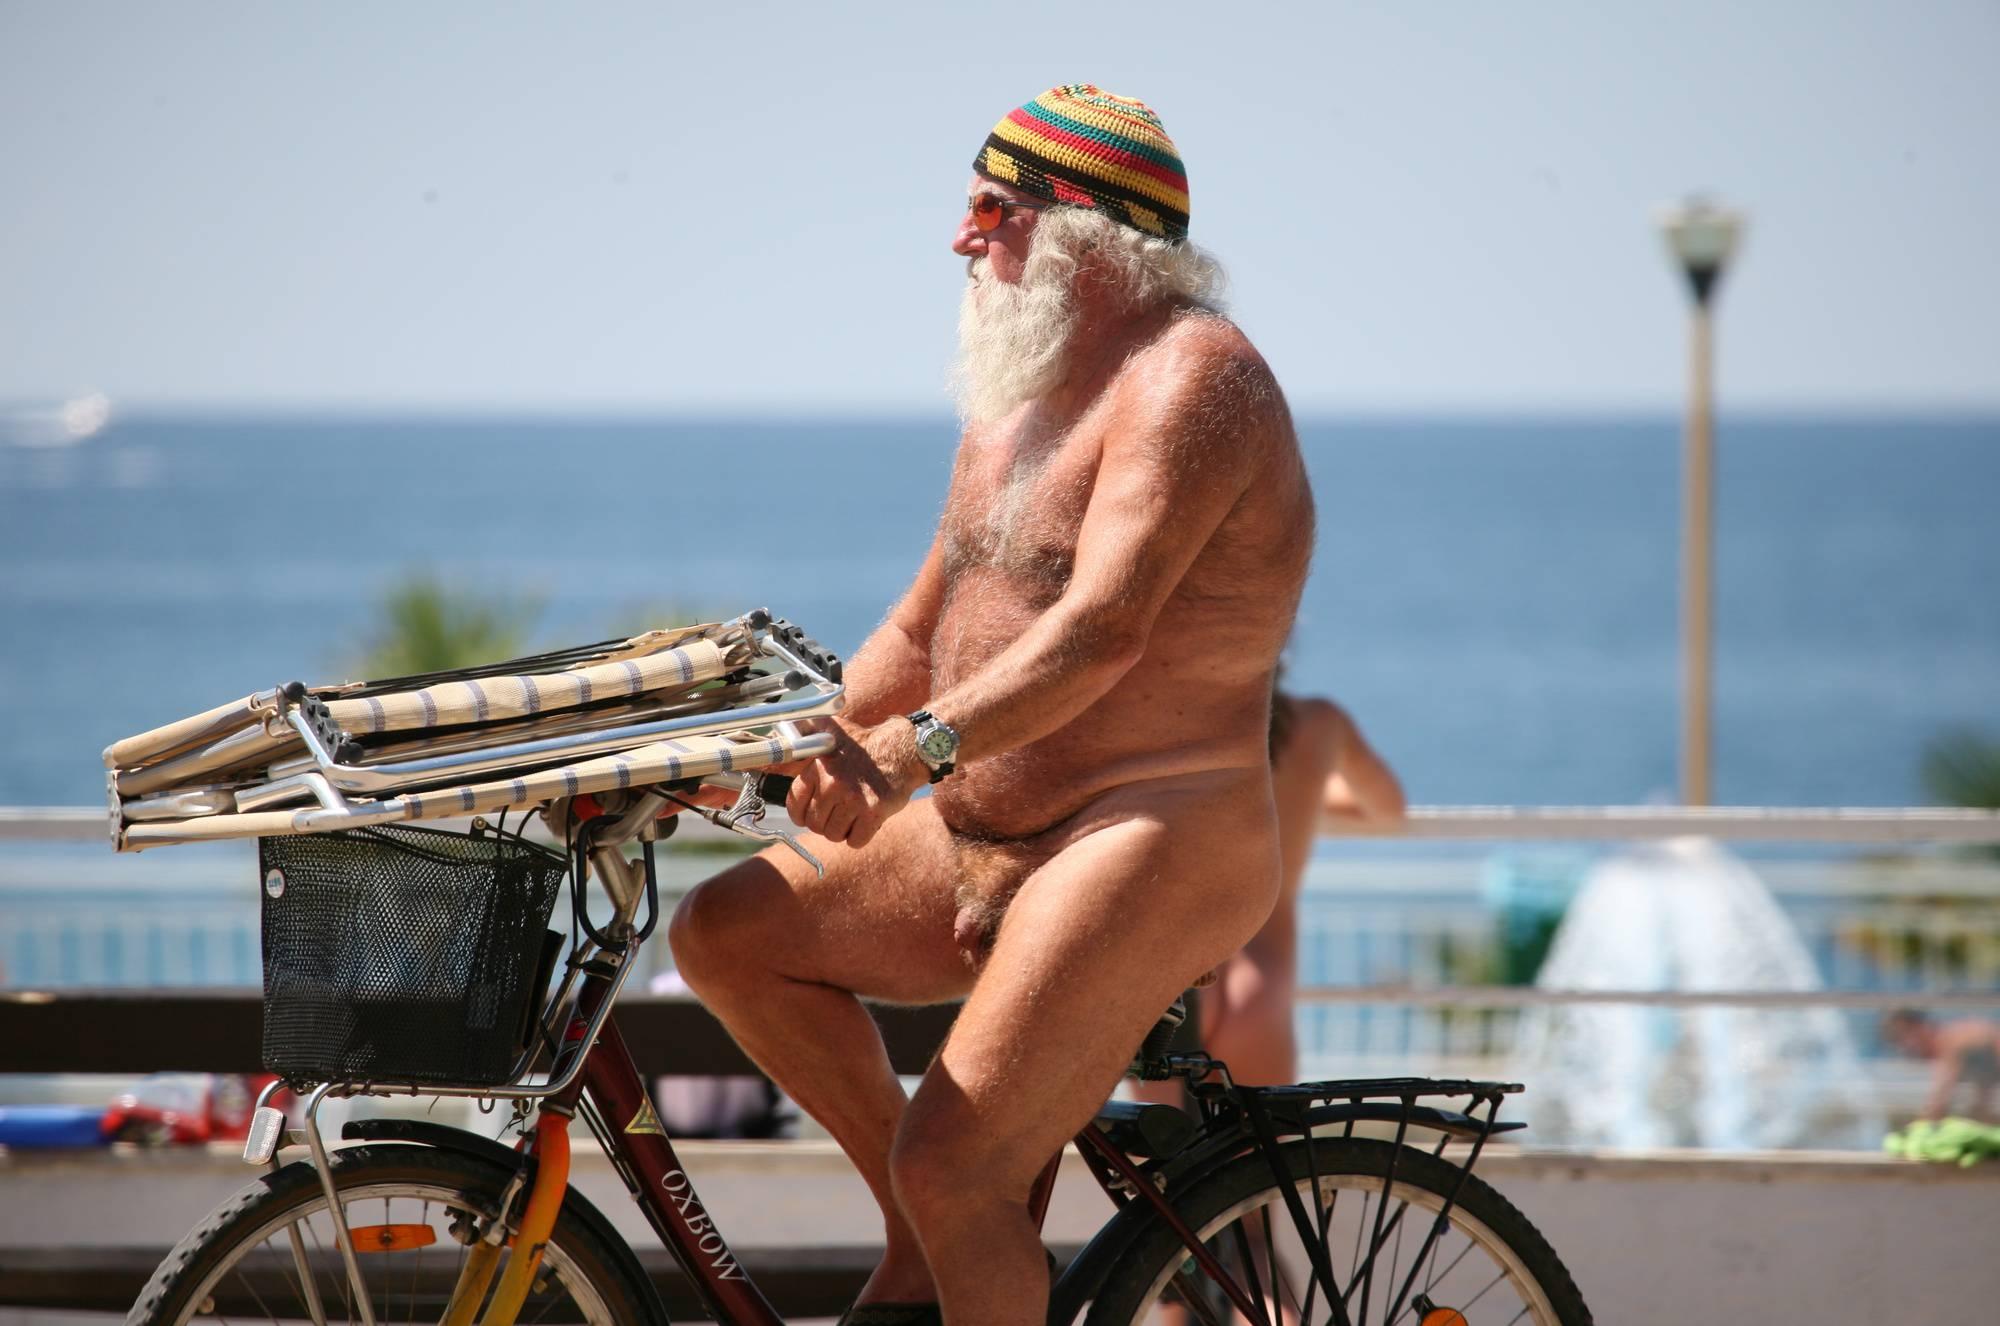 Nora FKK Outdoor Biking - 2